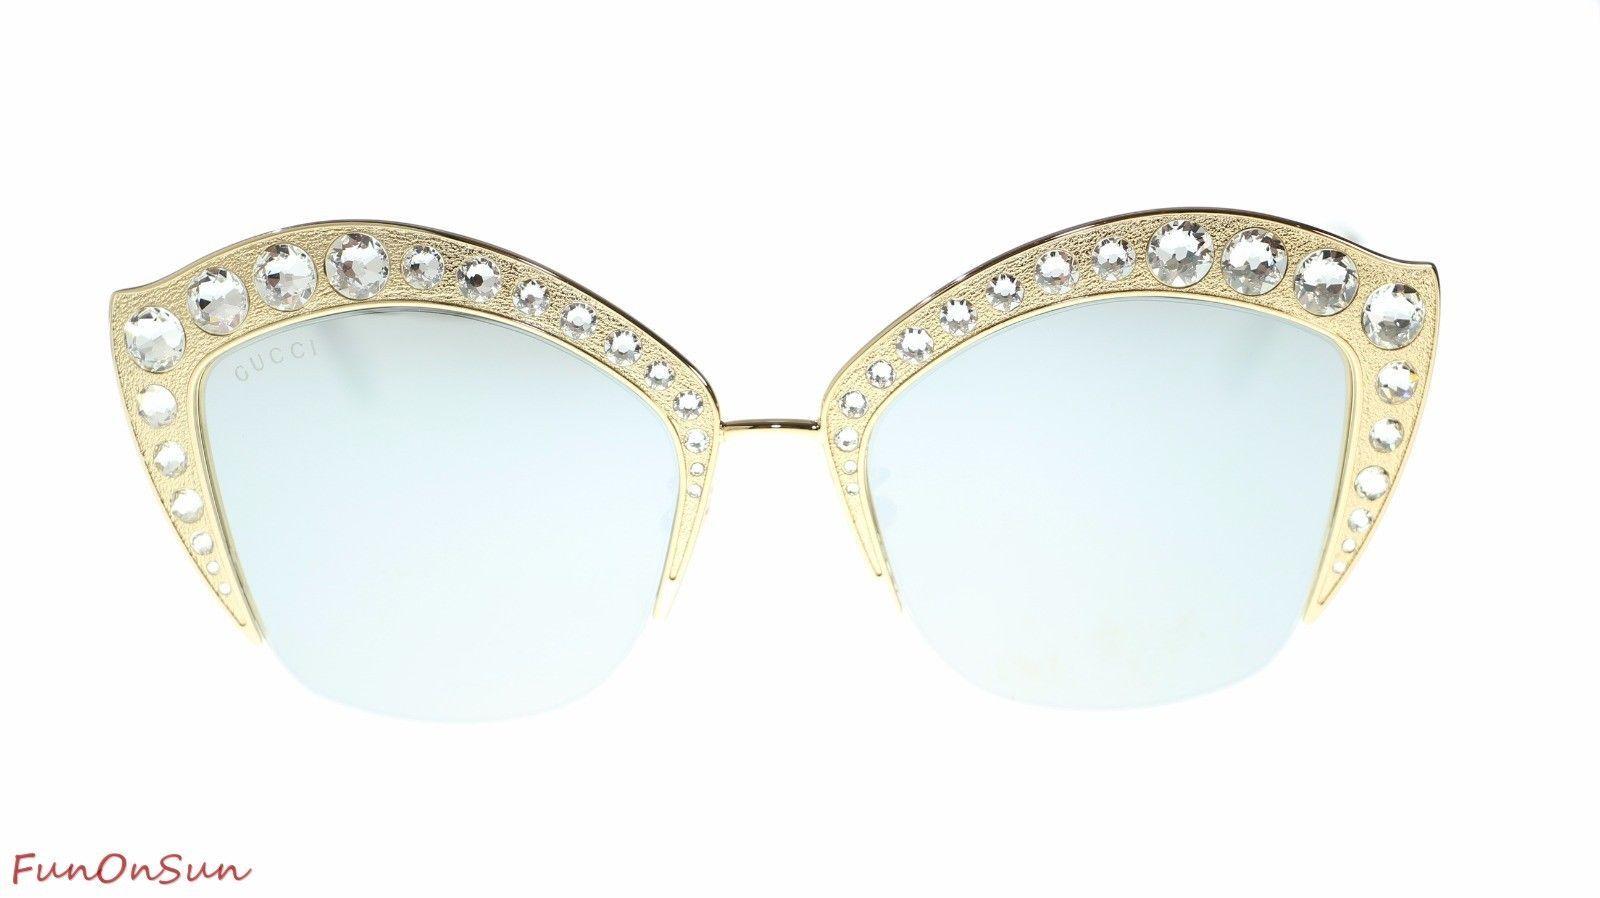 27b4122b8c54 Gucci Women Cat Eye Sunglasses GG0114S 004 and 27 similar items. 10